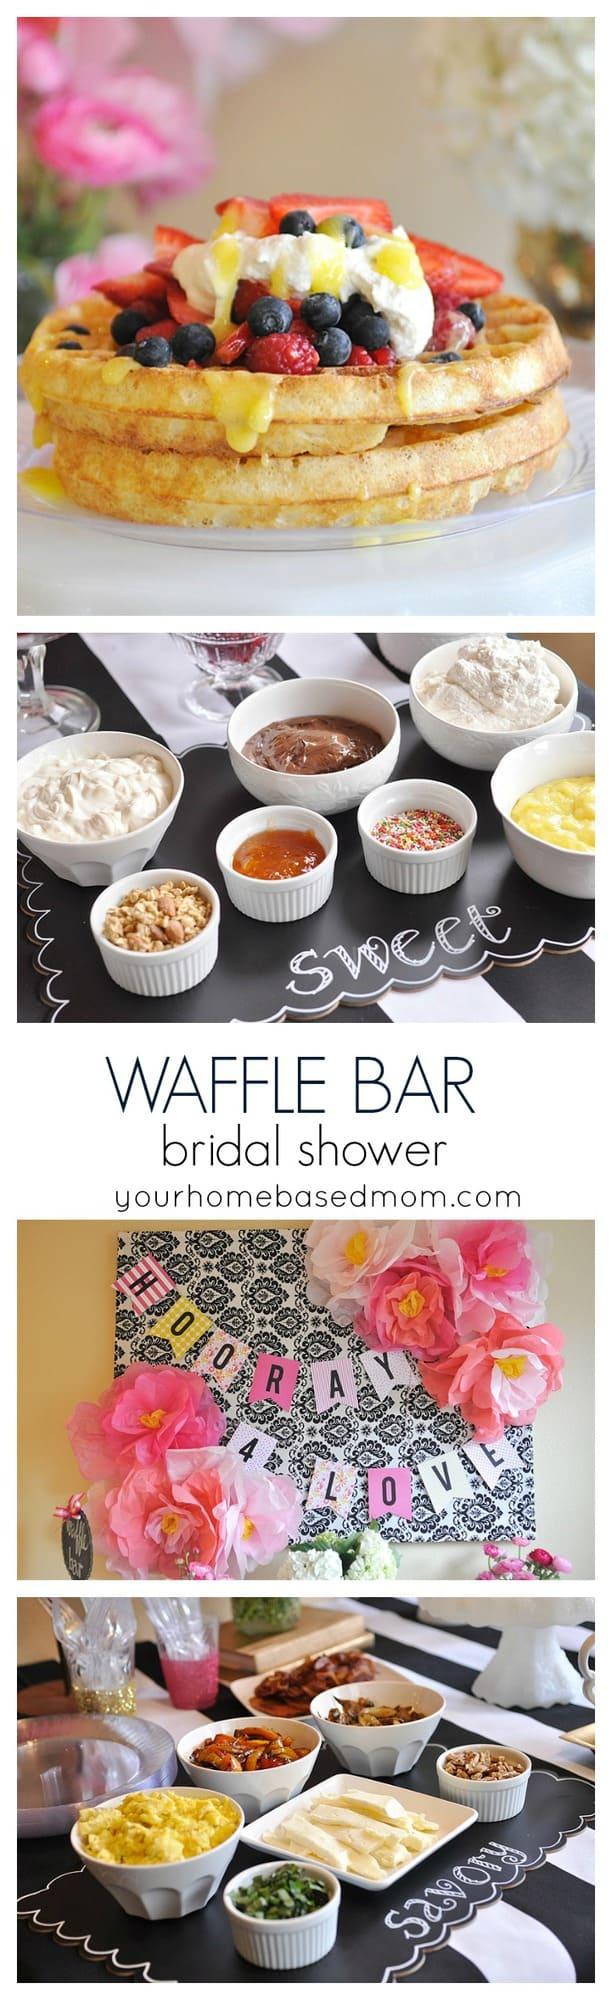 Waffle Bar Bridal Shower @yourhomebasedmom.com